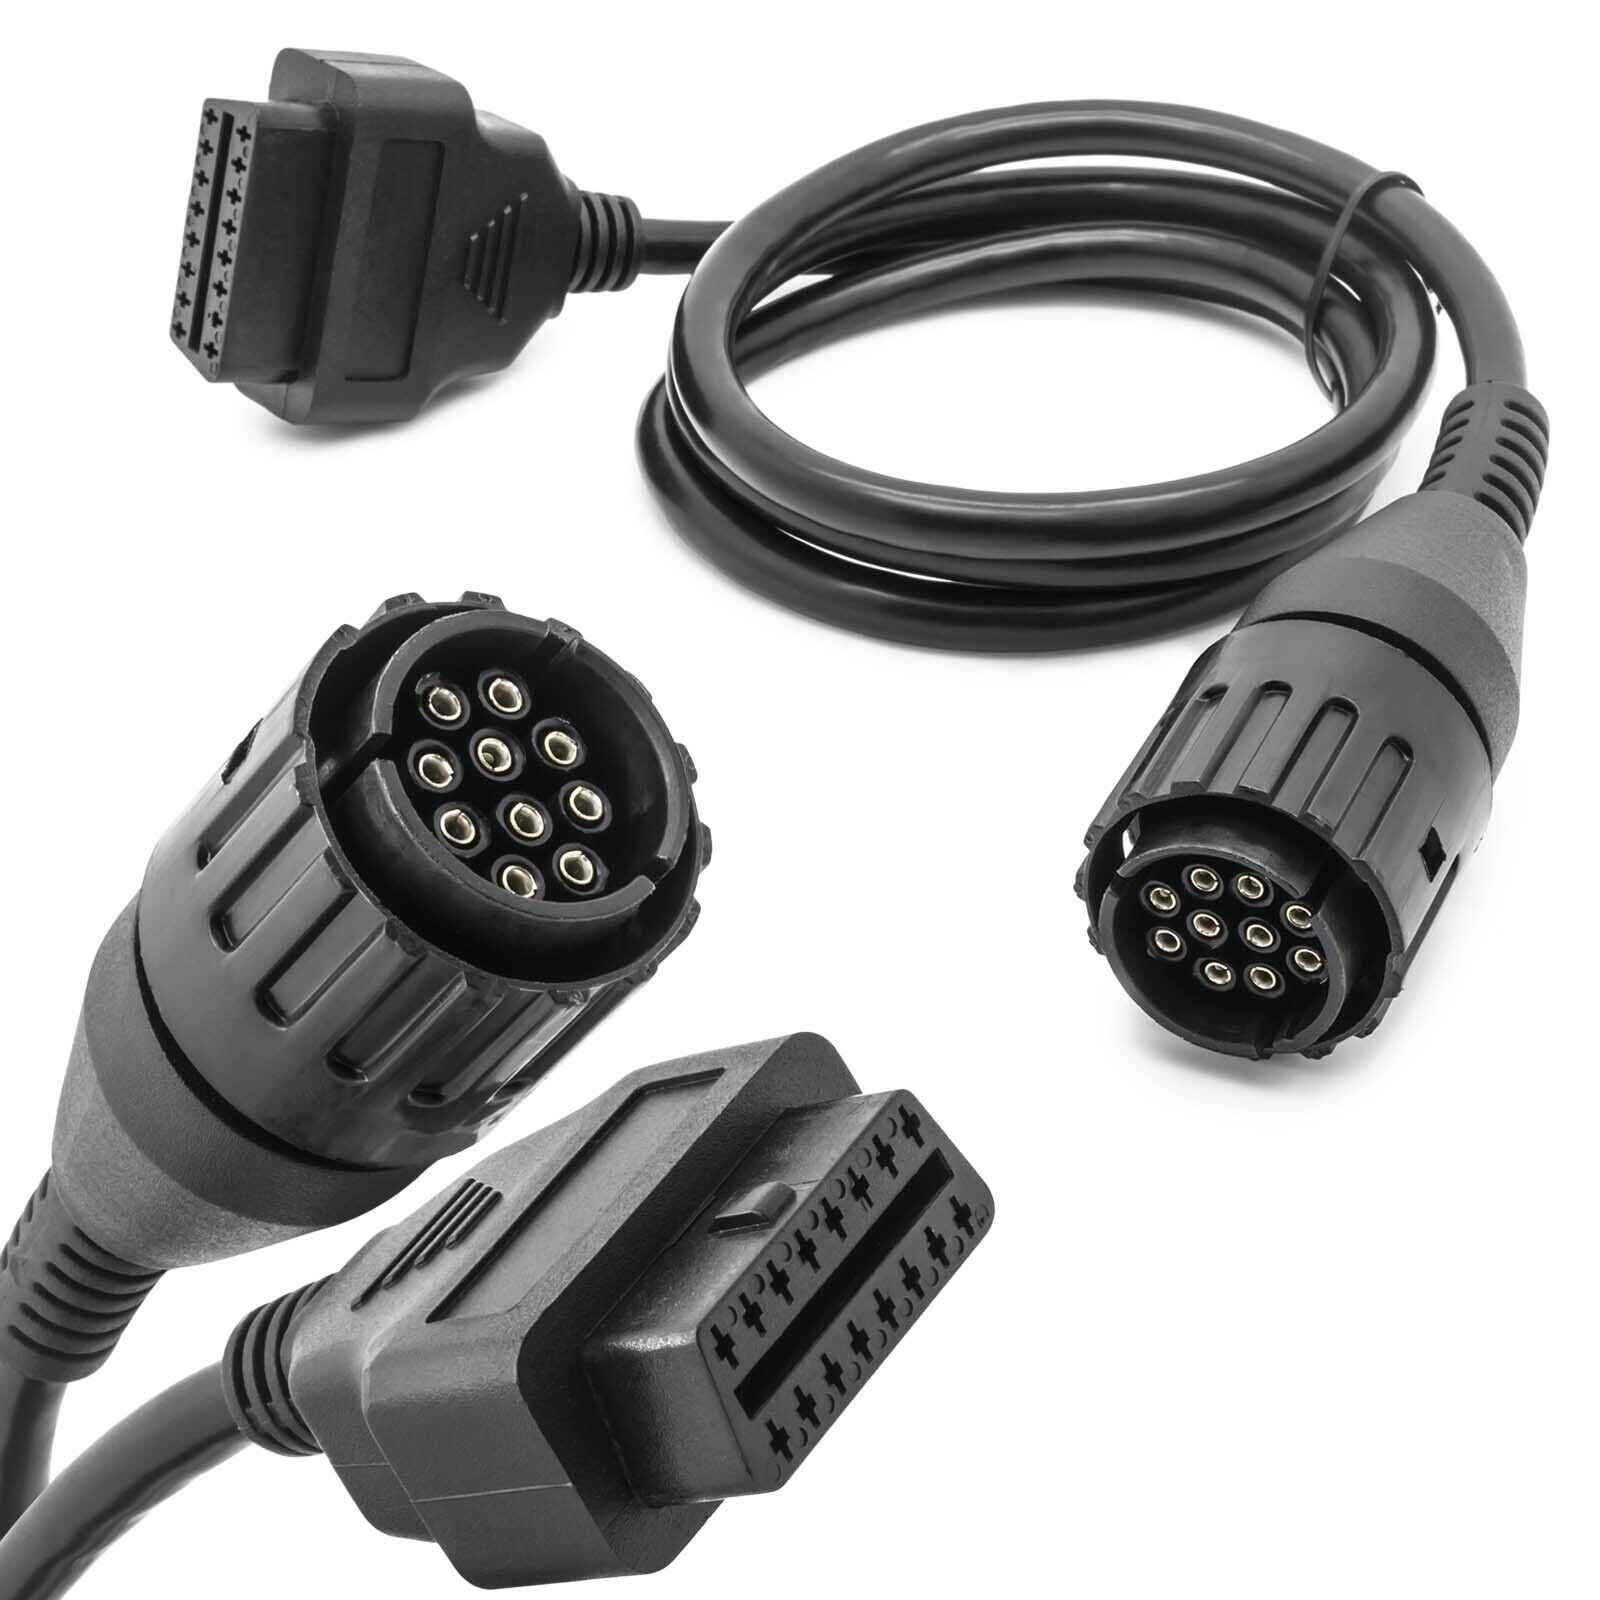 Auto Motorrad Adapterkabel 10 Pin auf 16 Pin OBD2 Adapterstecker Diagnosekabel